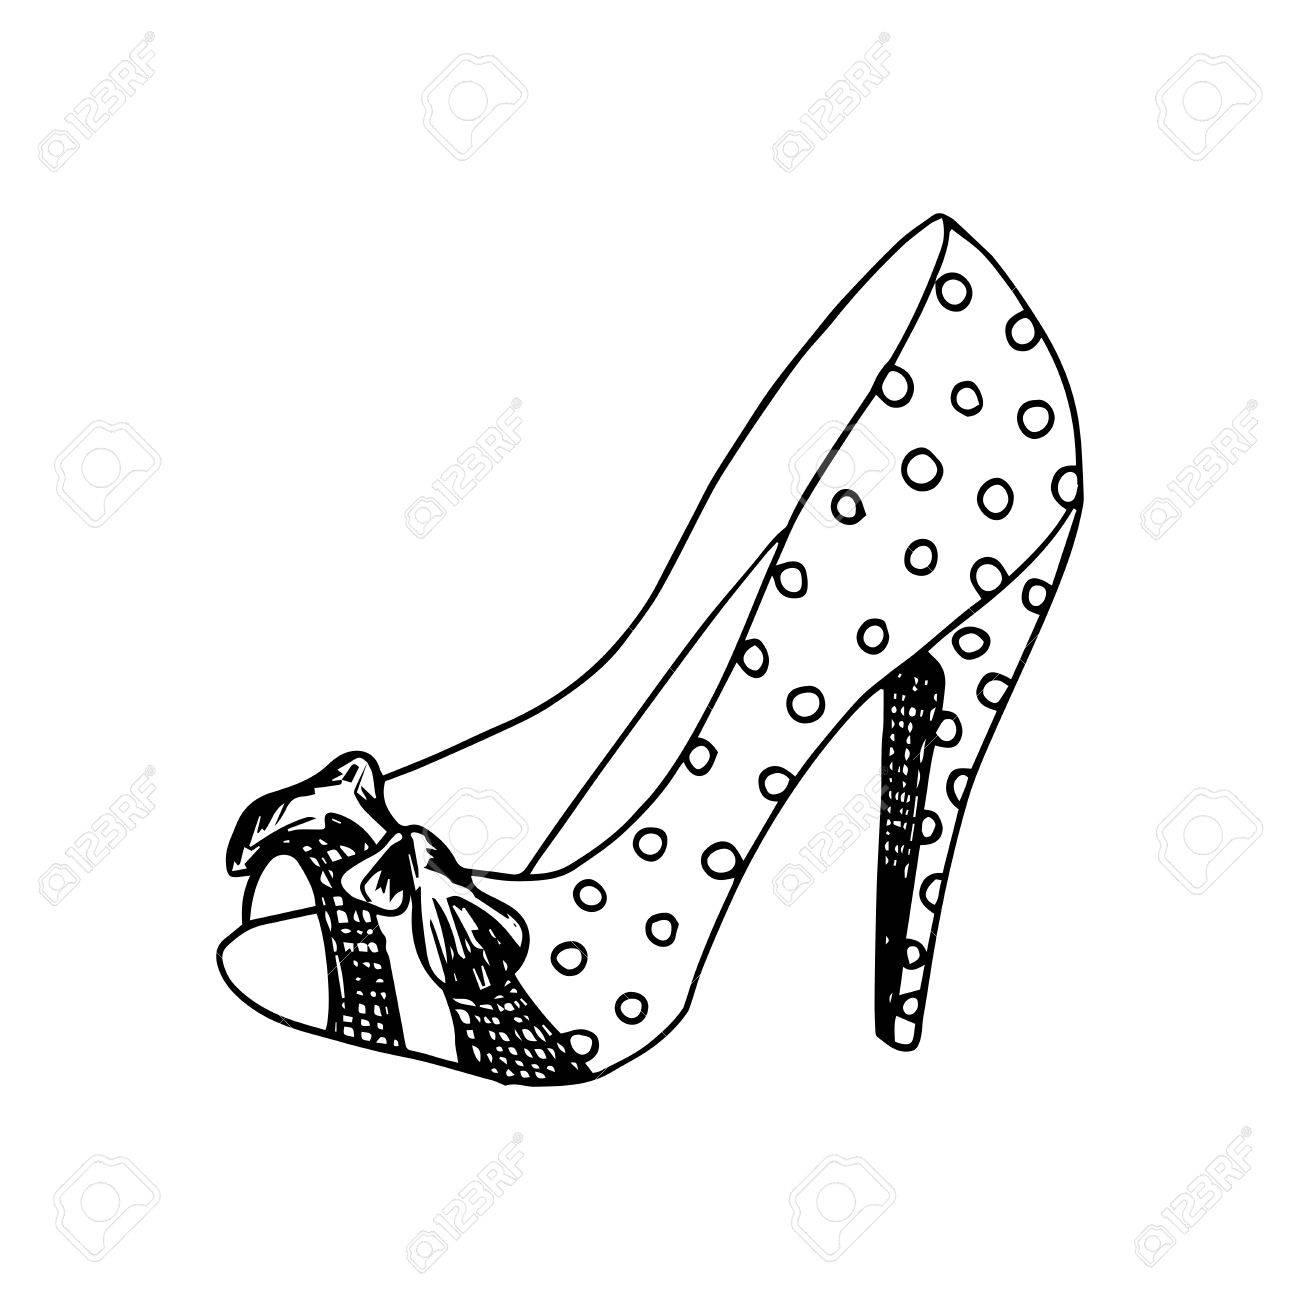 Calzado Obra De Moda Aislada Clipart Mujer Tacón Alto Zapatos Para HqUC0Y0w